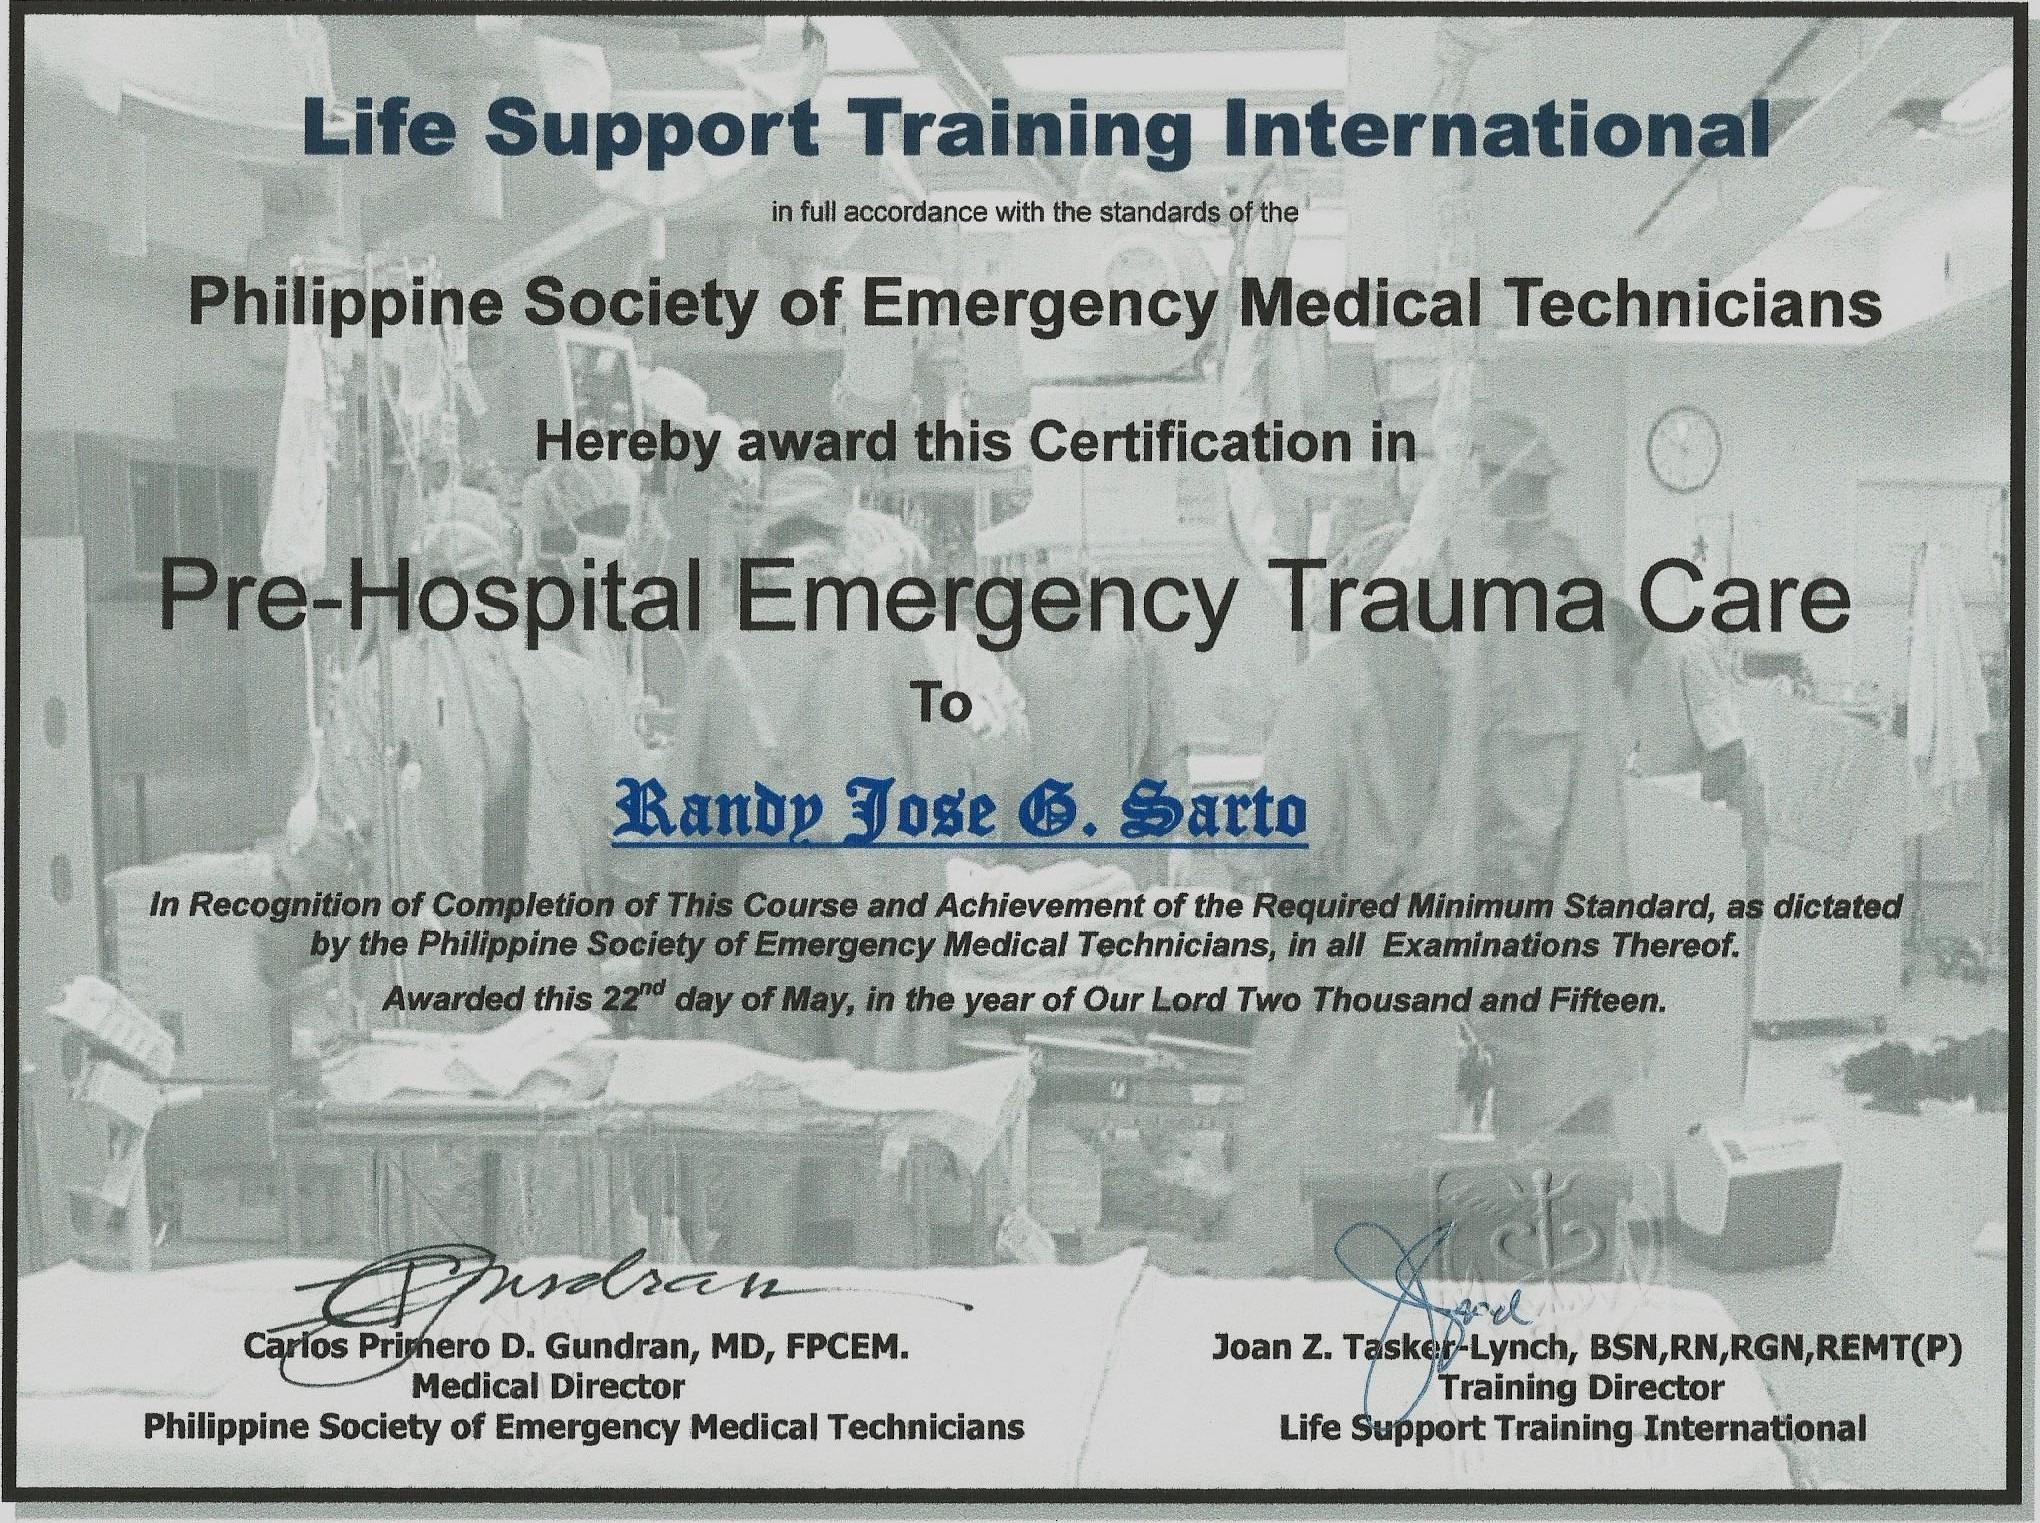 Randy sarto bayt pre hospital emergency trauma care certificate xflitez Images